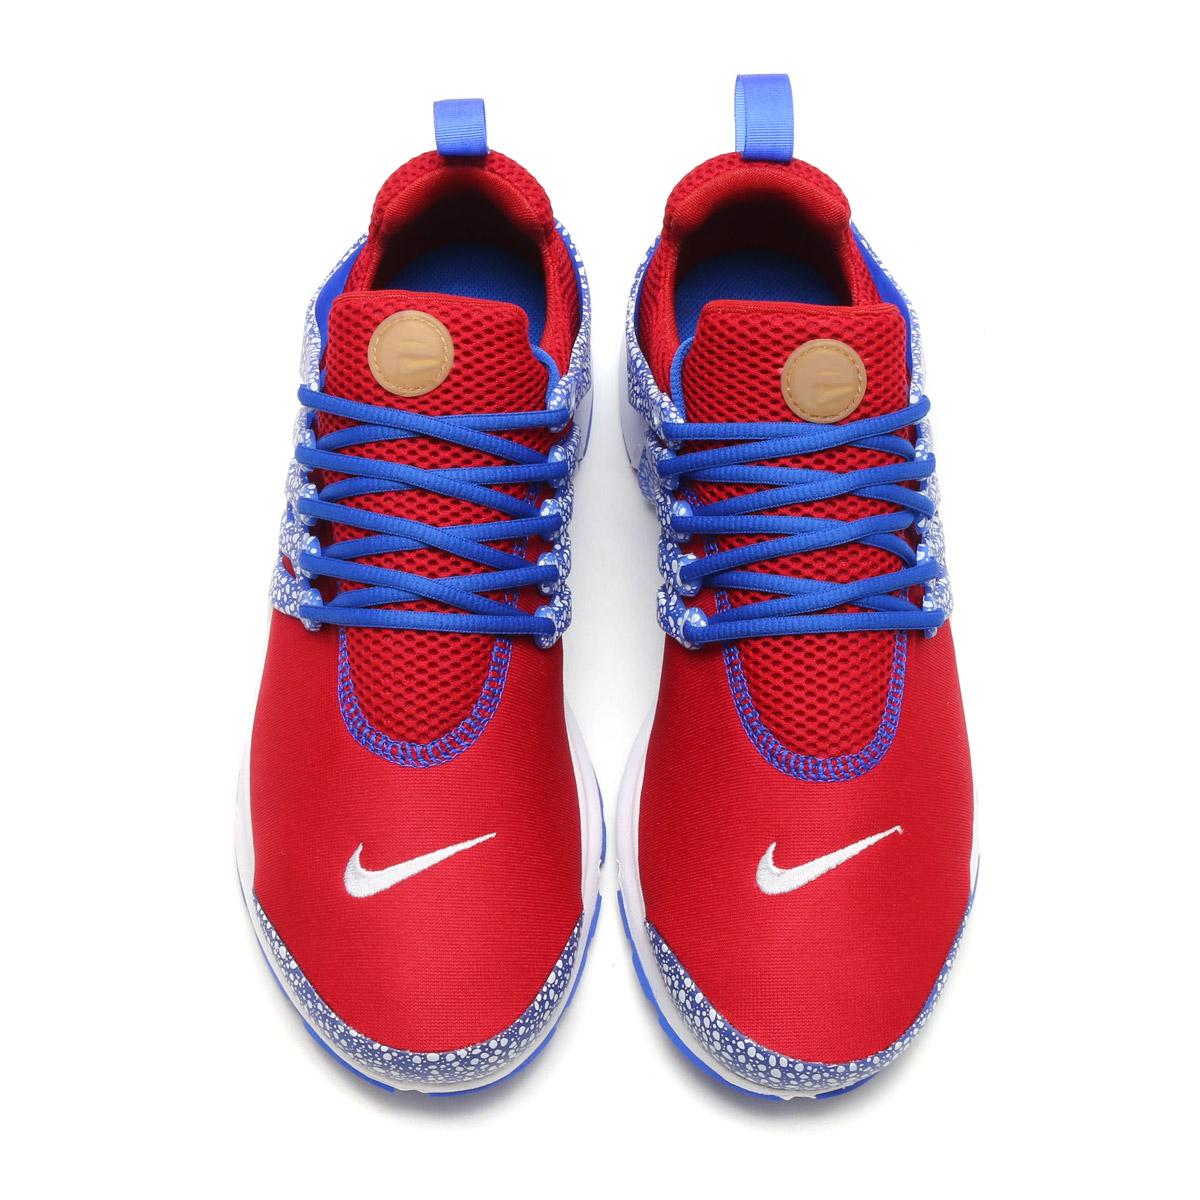 separation shoes 79717 a61f6 NIKE AIR PRESTO QS (Kie Ney apr strike QS) (GYM RED RACER BLUE-WHITE) 17SU-S